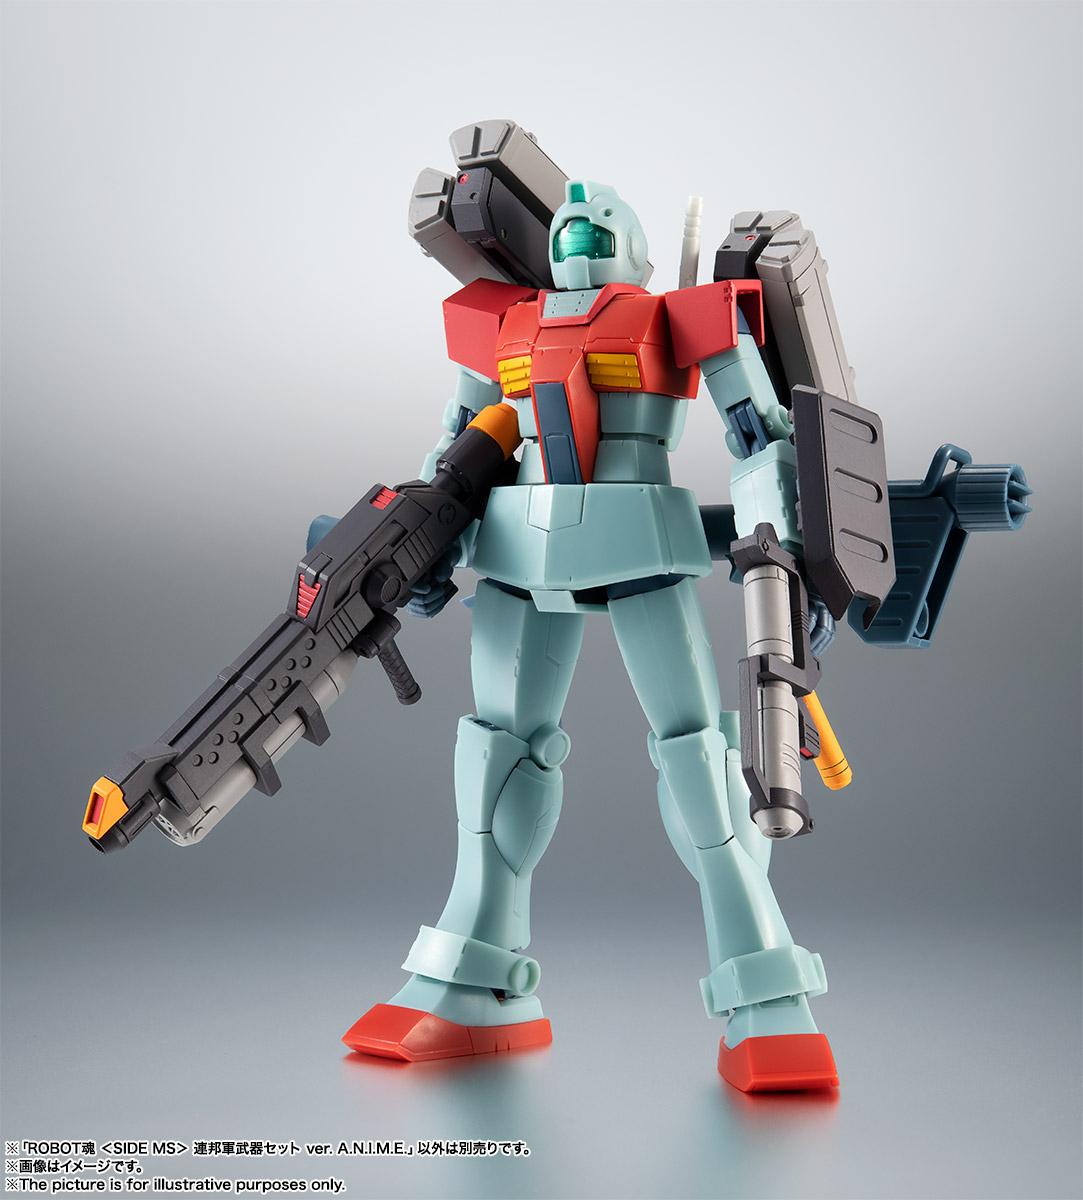 ROBOT魂〈SIDE MS〉『連邦軍武器セット ver. A.N.I.M.E.』ガンダム 完成品フィギュア-003